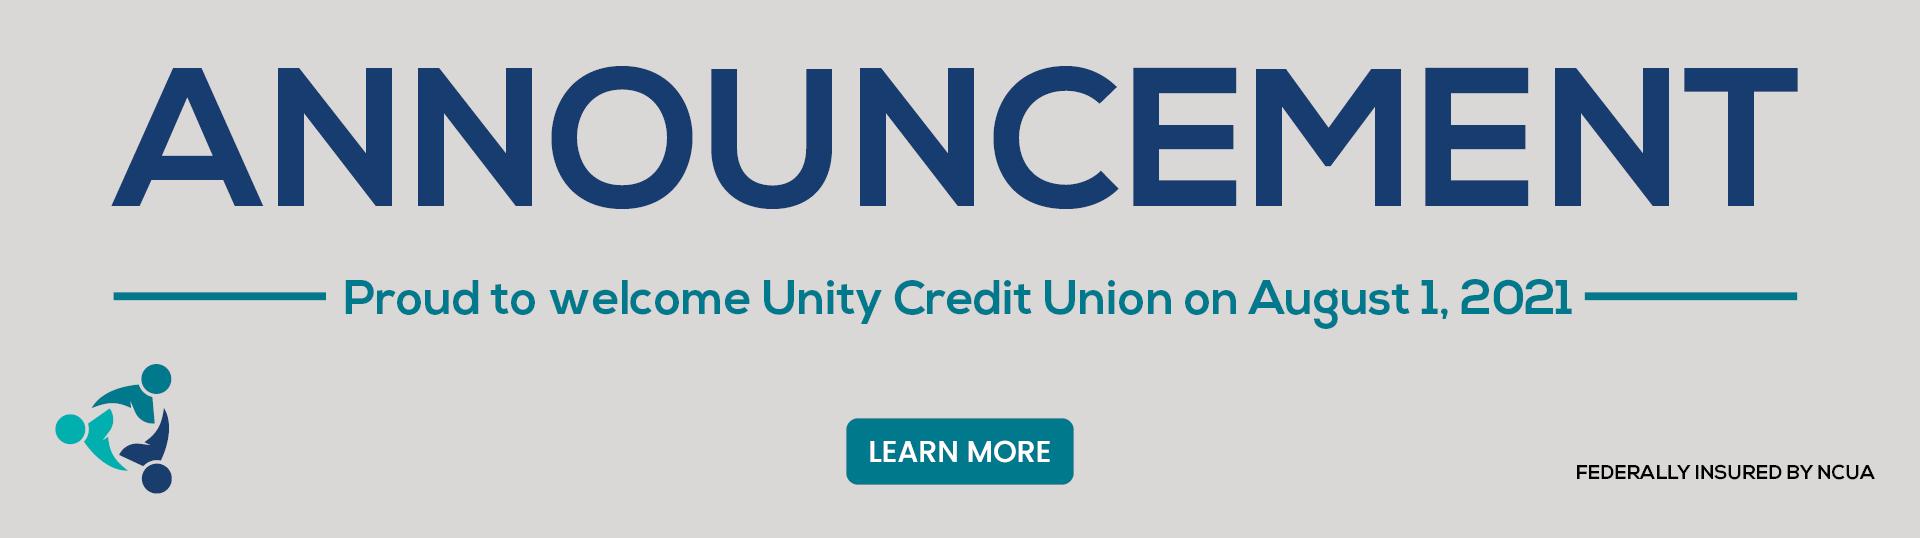 Welcome Unity website banner